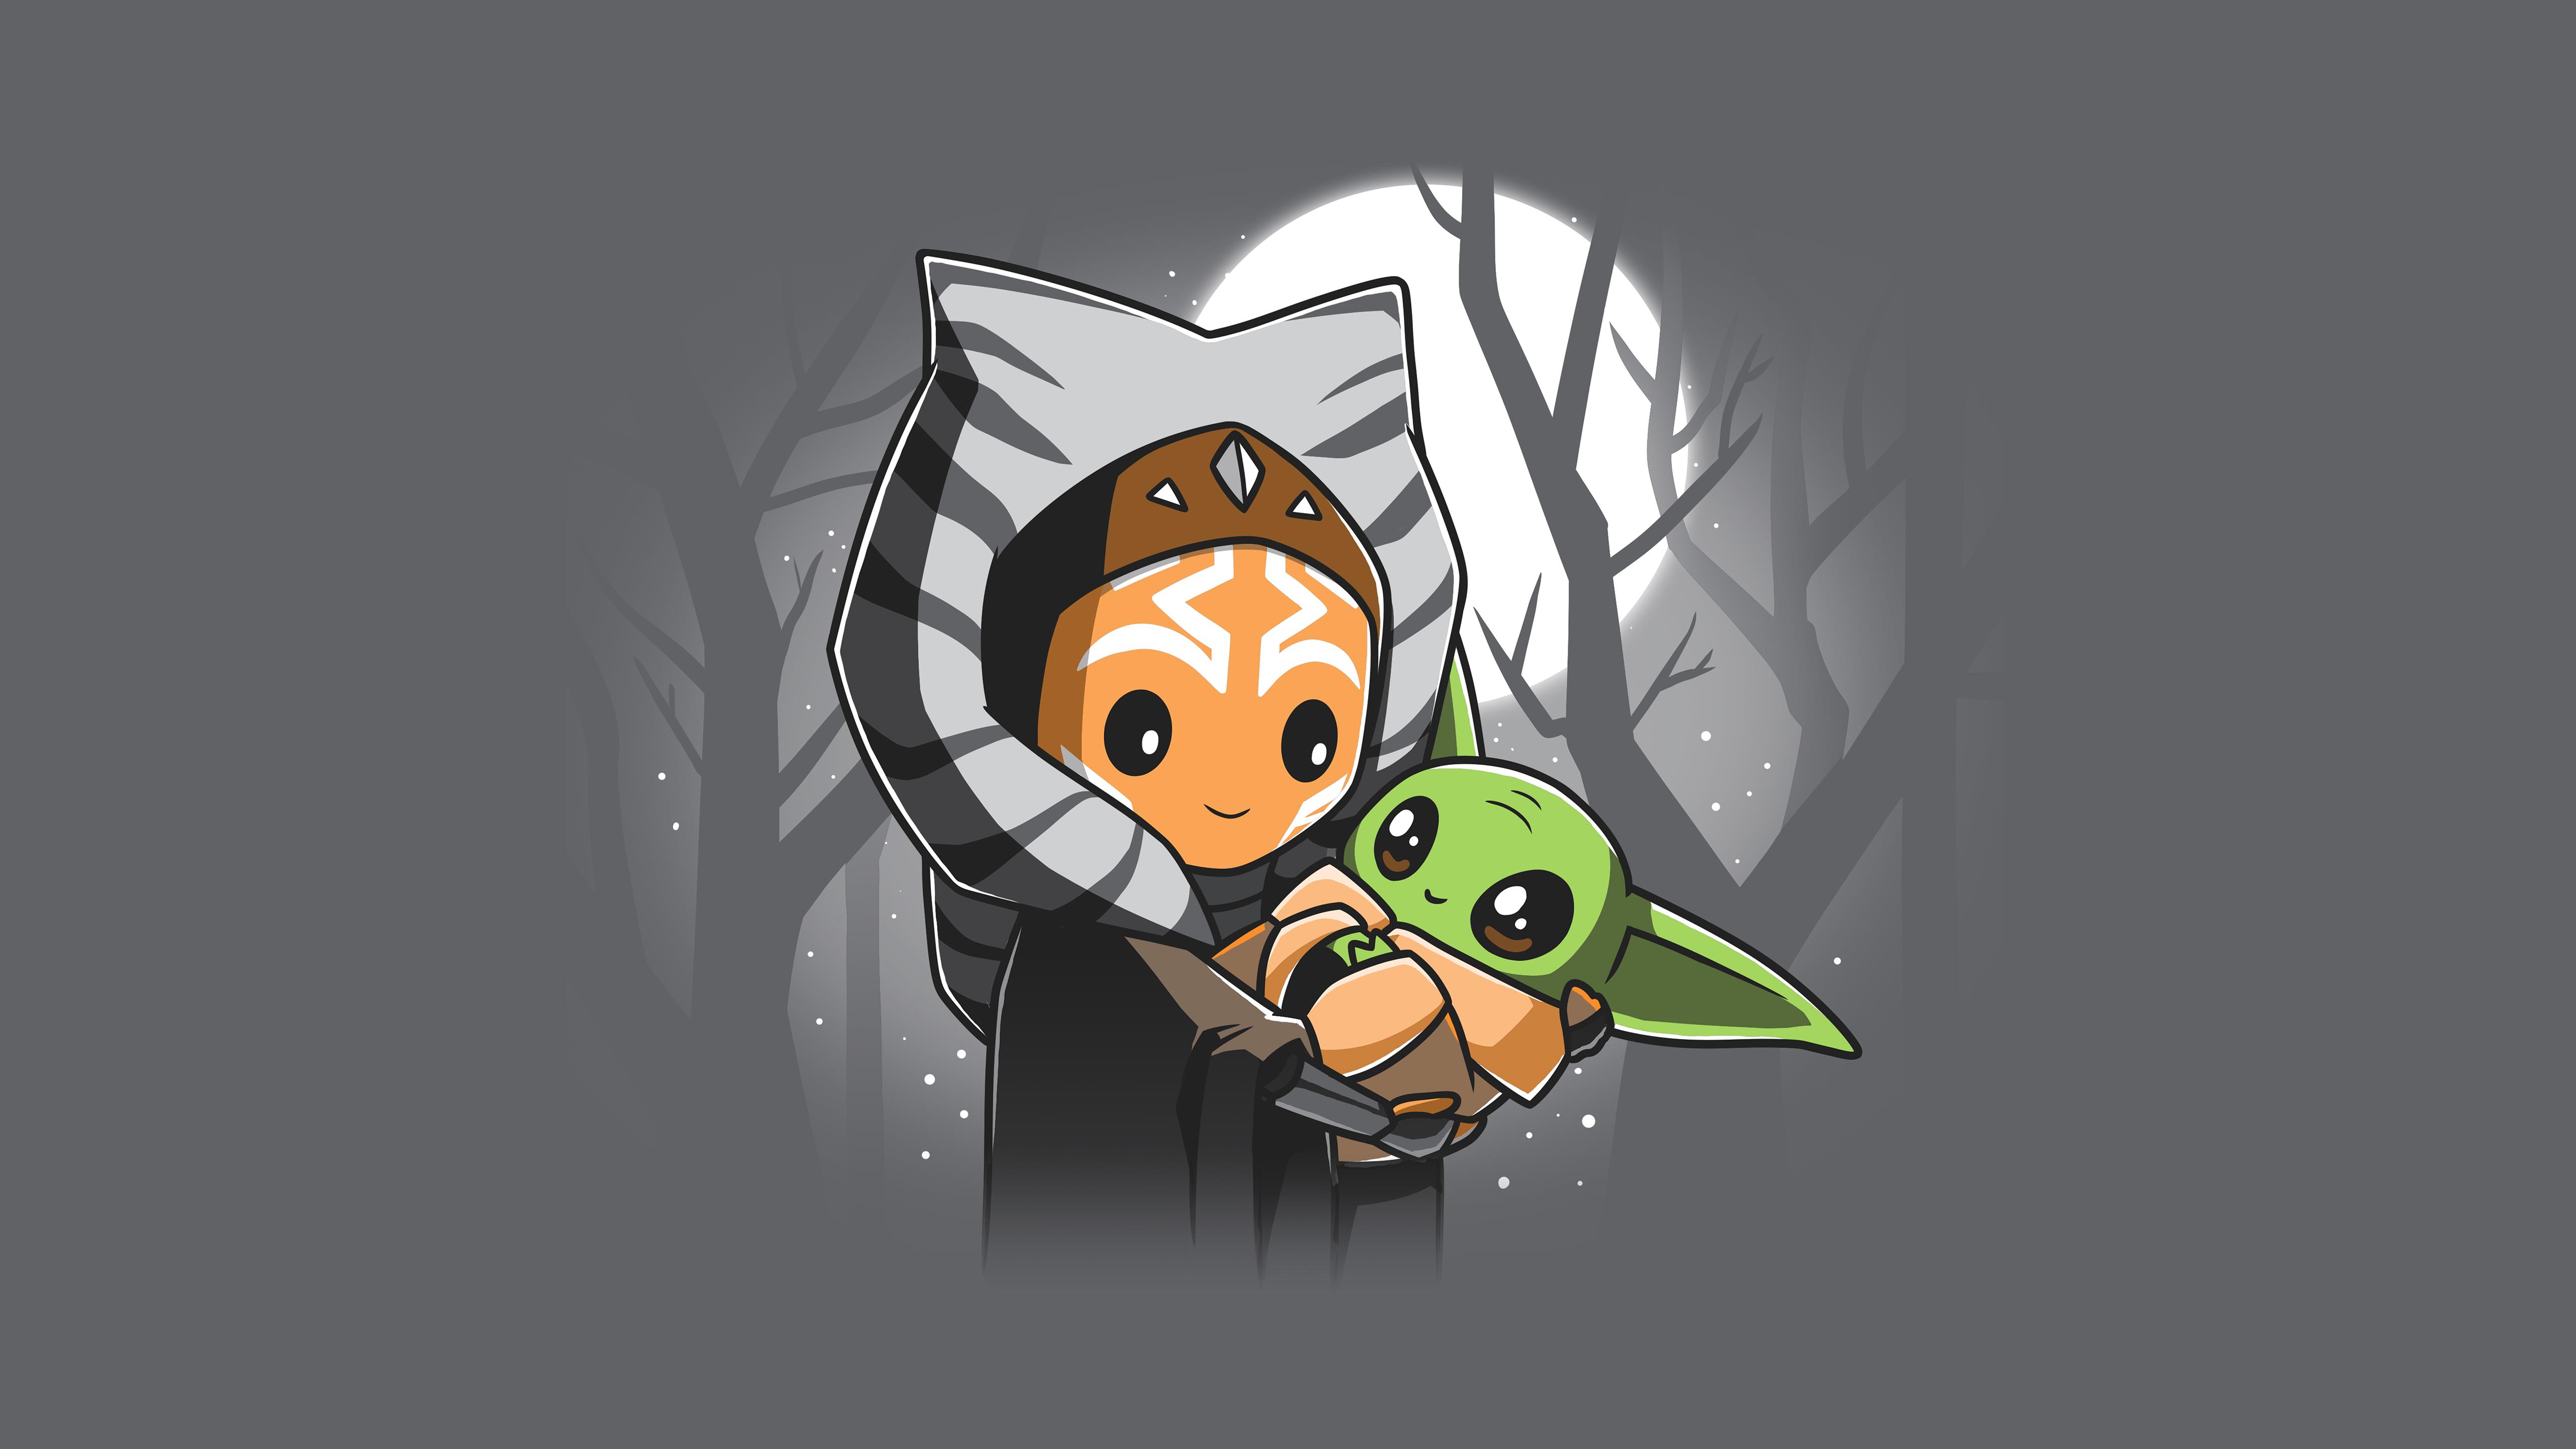 Star Wars Ahsoka Tano Artwork Grogu Baby Yoda The Mandalorian Gray Background Jedi Minimalism 5120x2880